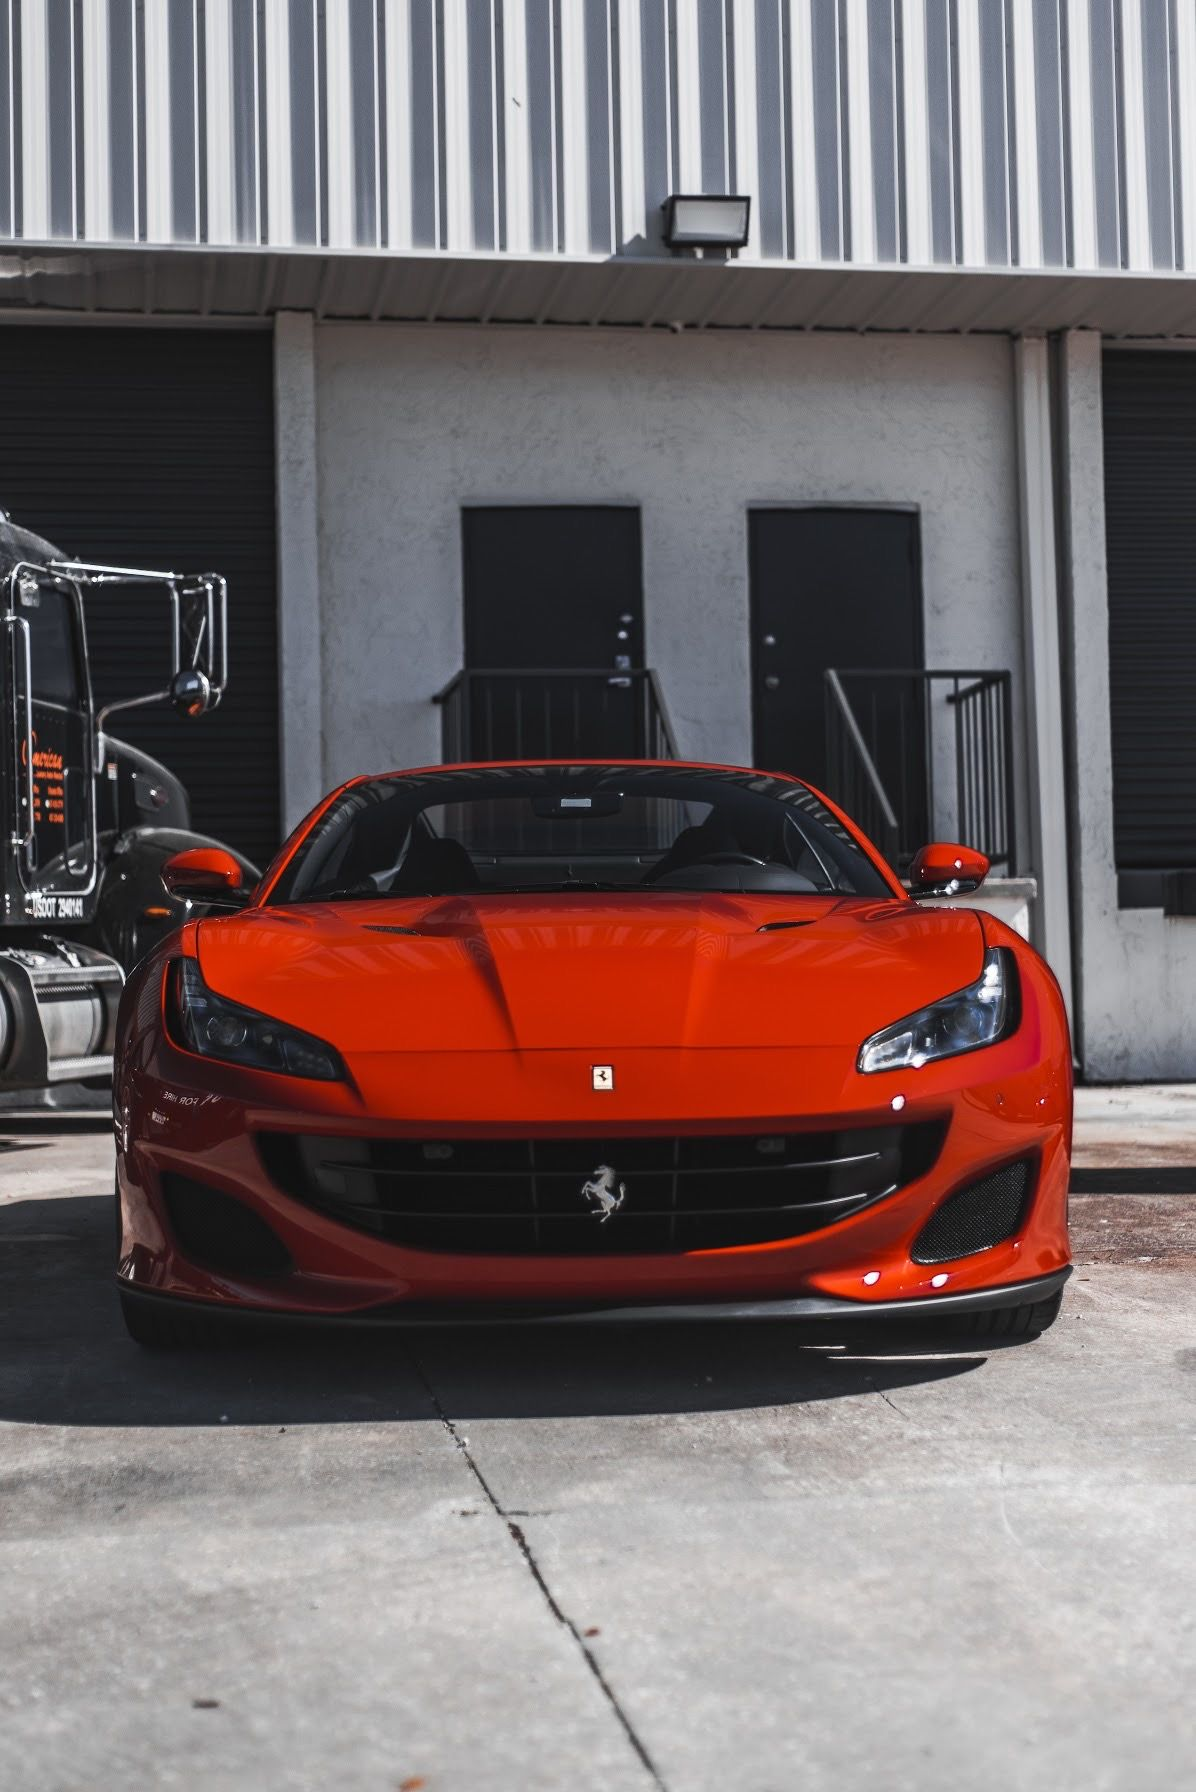 The Brand New 2020 Ferrari Portofino Has Arrived And Car Concierge